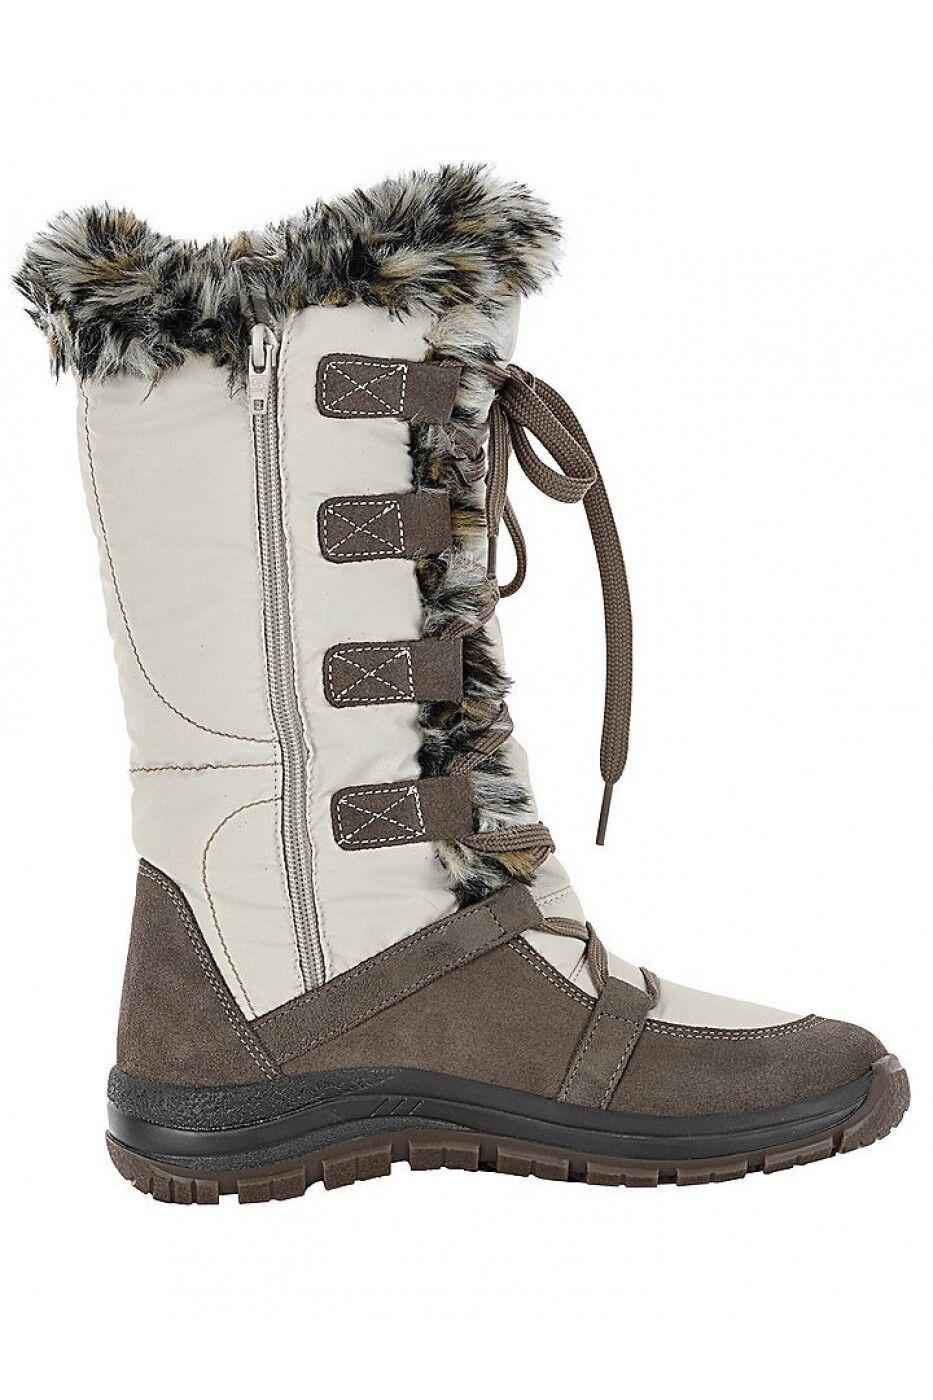 Heine Zip Up Snow Stiefel Cream UK UK UK 5 EU 38 LN181 AF 04 f002c4